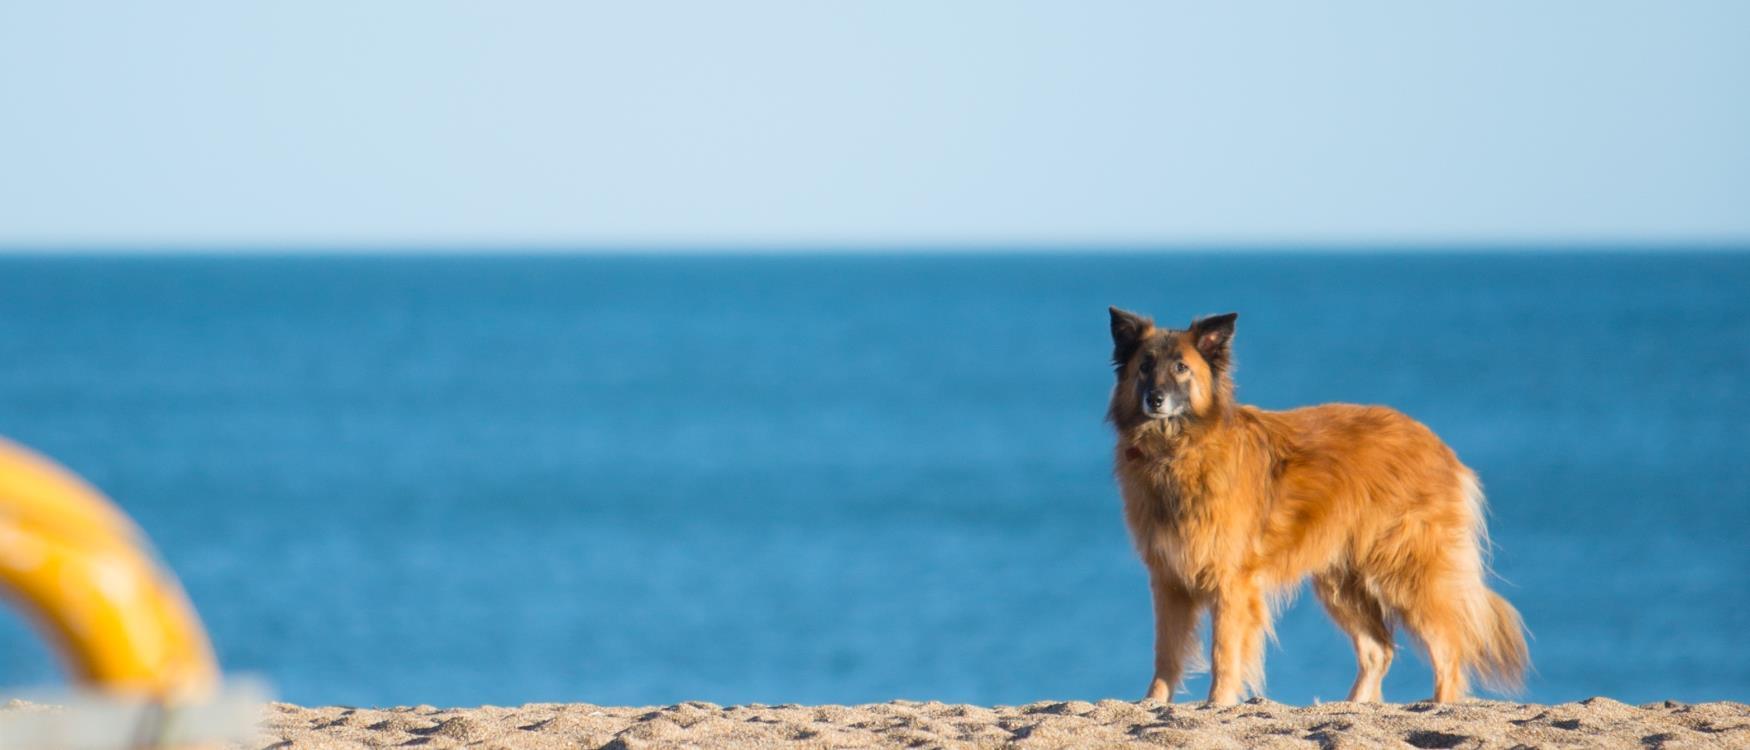 Is Paington Beach Dog Friendly